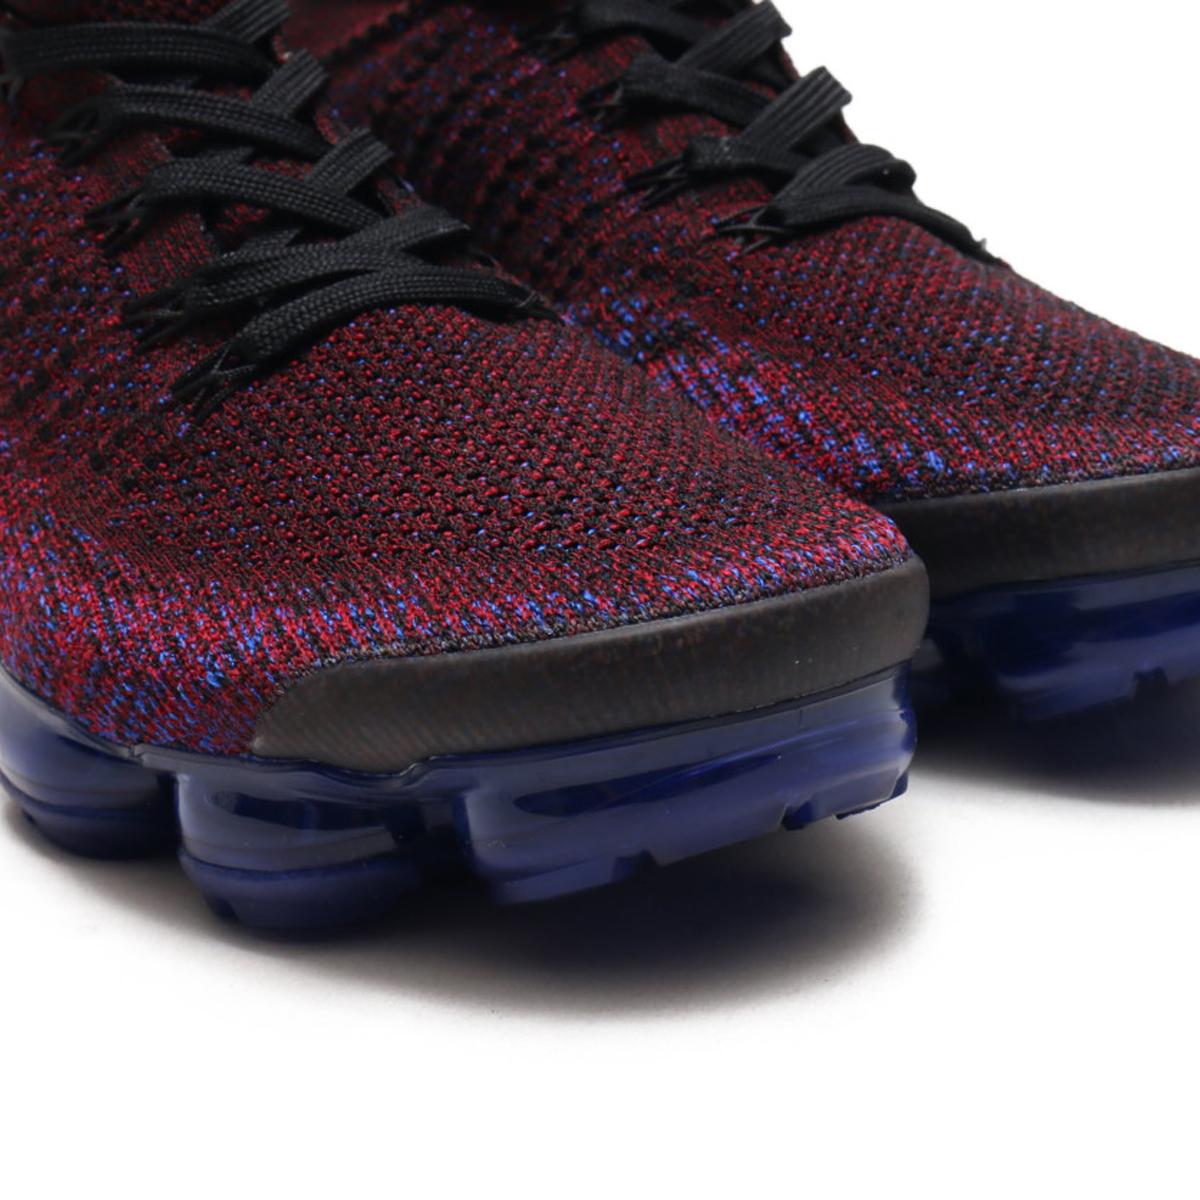 26faaa42115b NIKE AIR VAPORMAX FLYKNIT 2 (Nike air vapor max fried food knit 2)  (BLACK BLACK-TEAM RED-RACER BLUE) 18SU-S